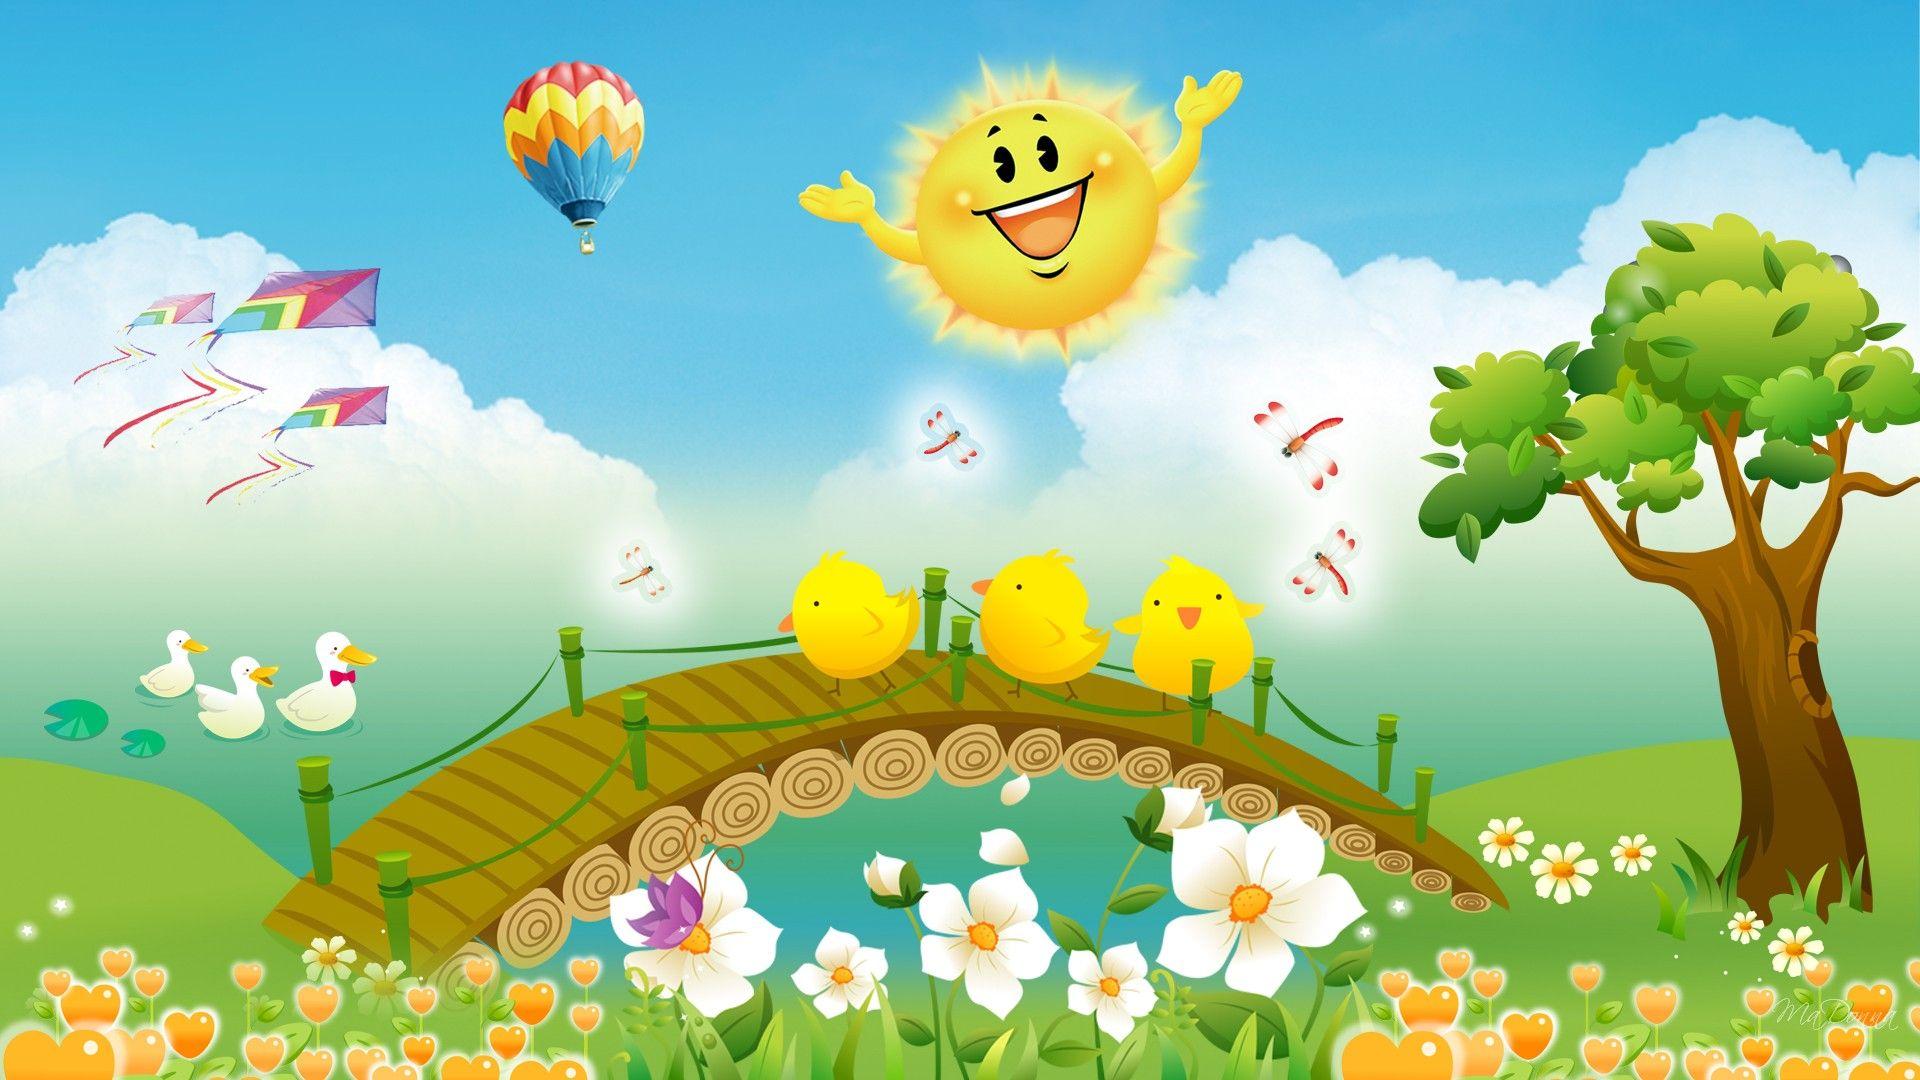 Summer Fun 150 x 150 300 x 168 530 x 298 1920 x 1080 With 1920x1080